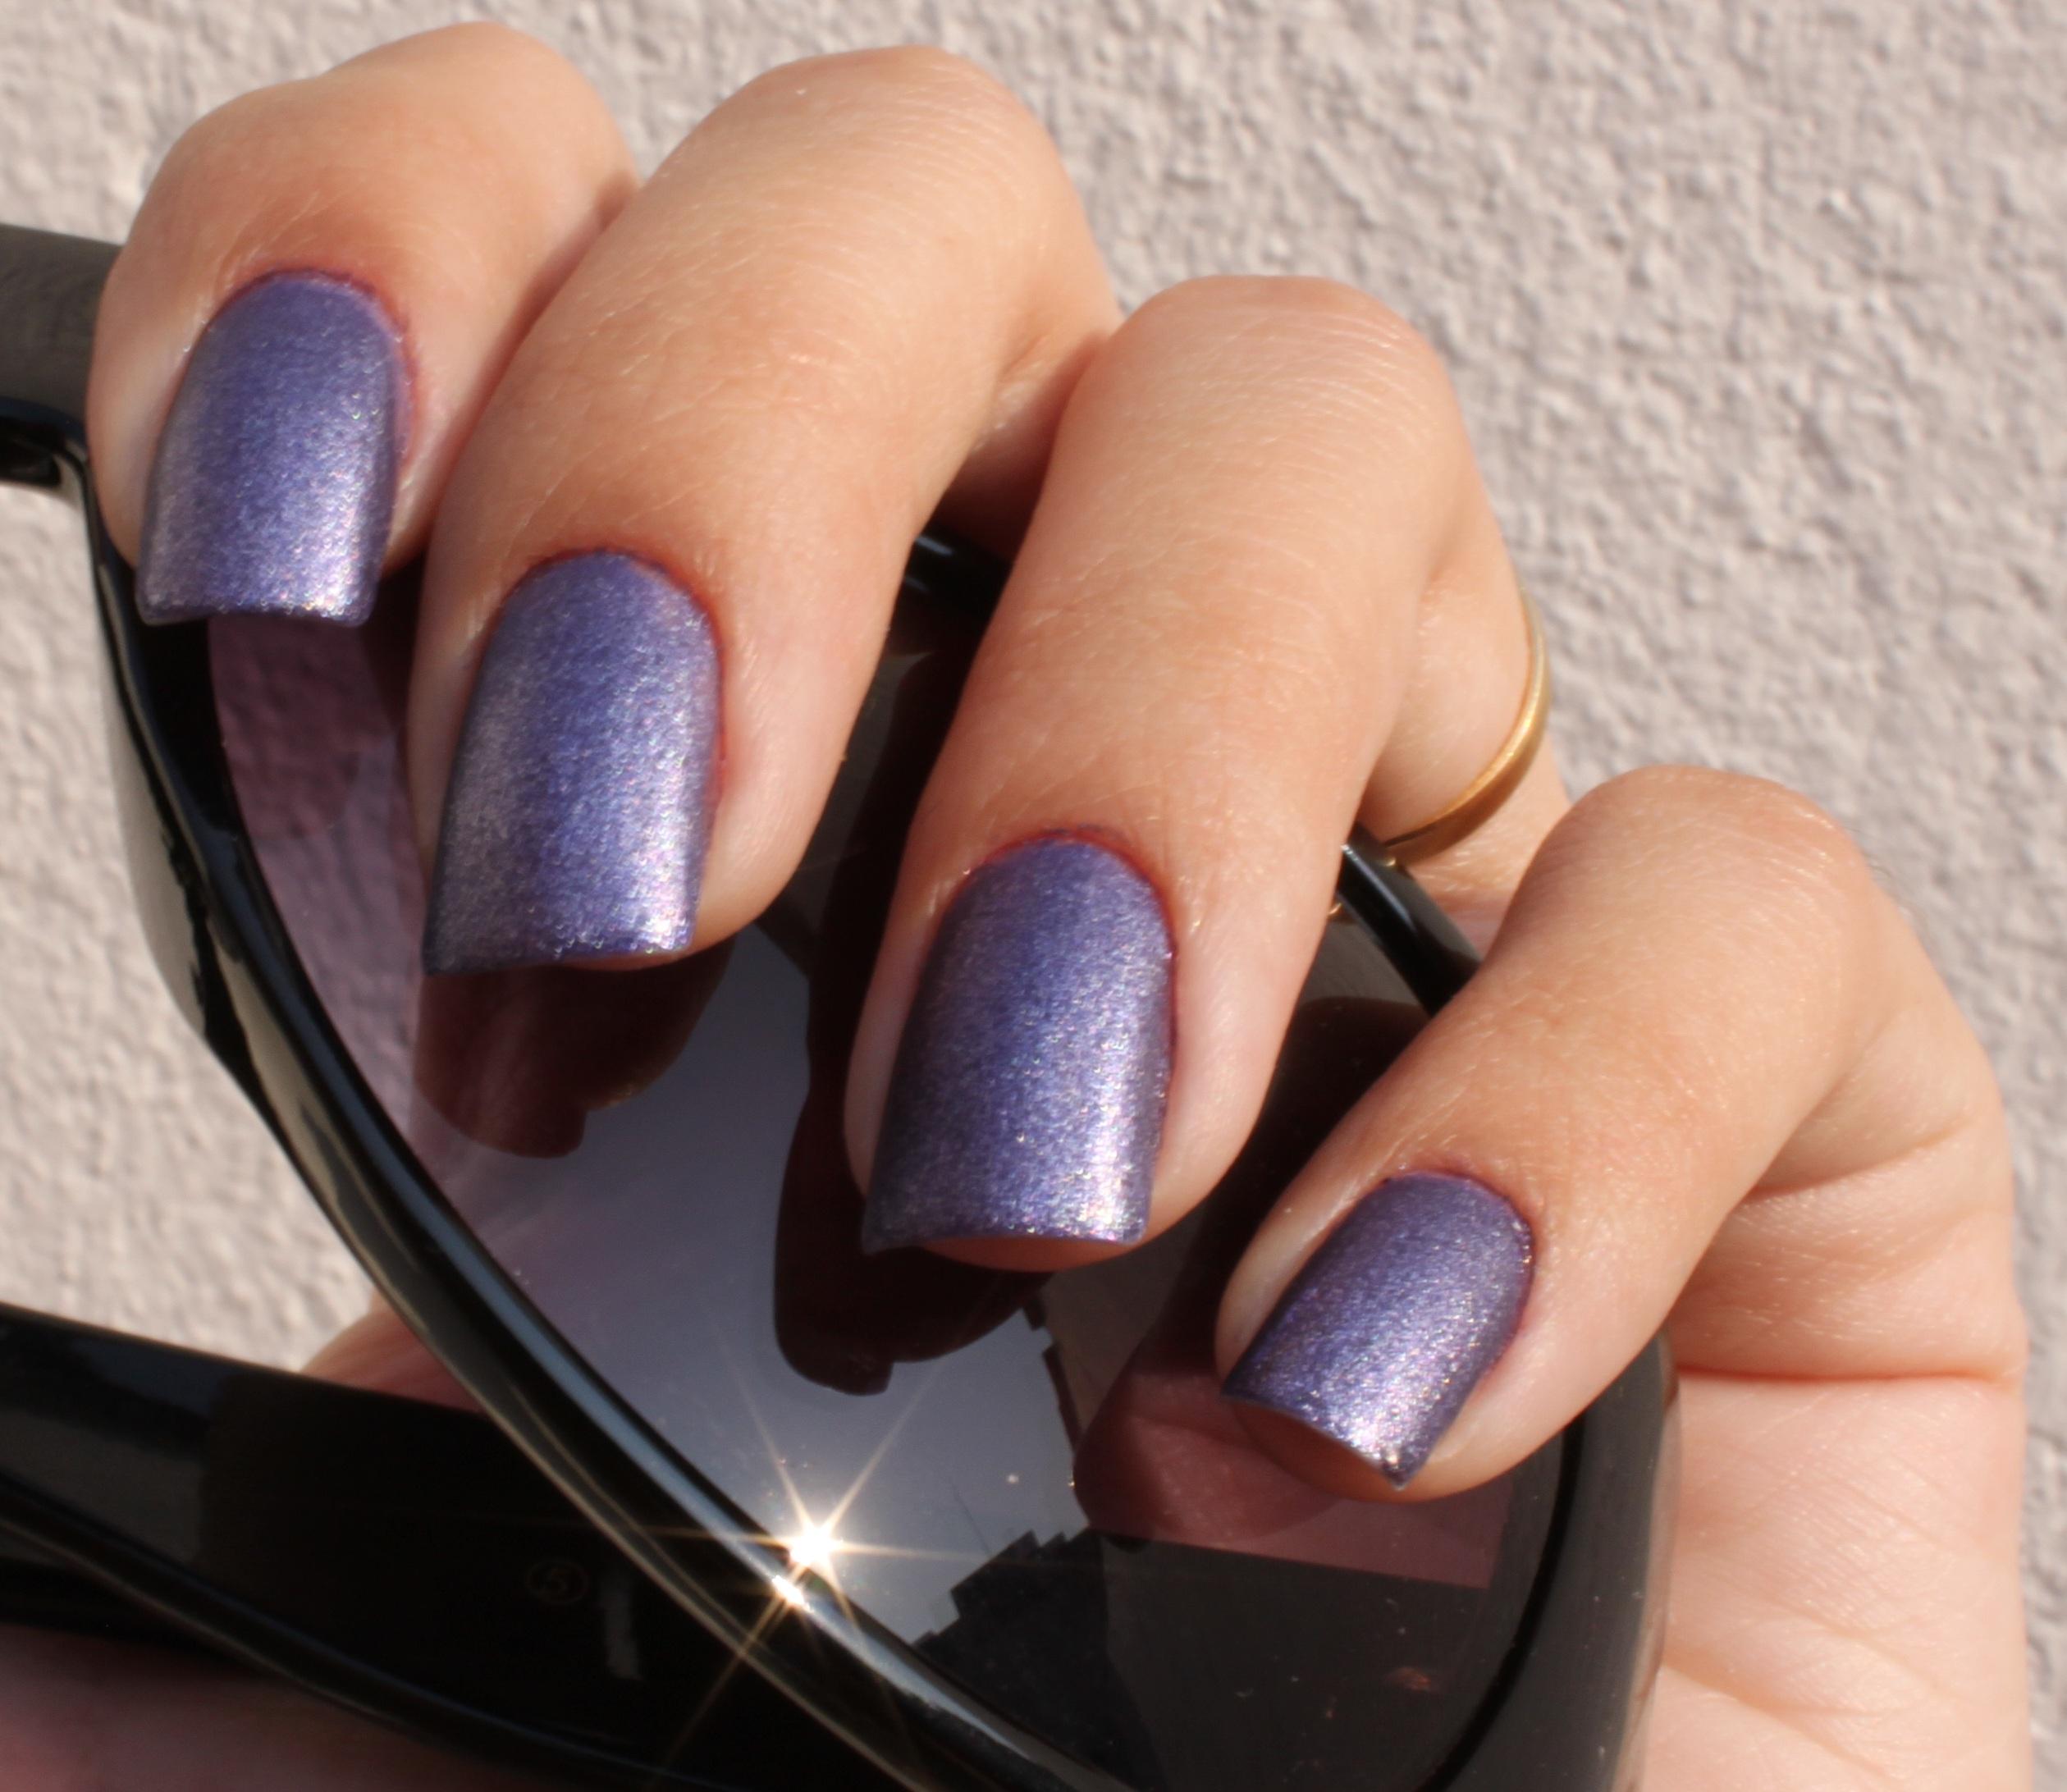 File:Violete nail colour.jpg - Wikimedia Commons